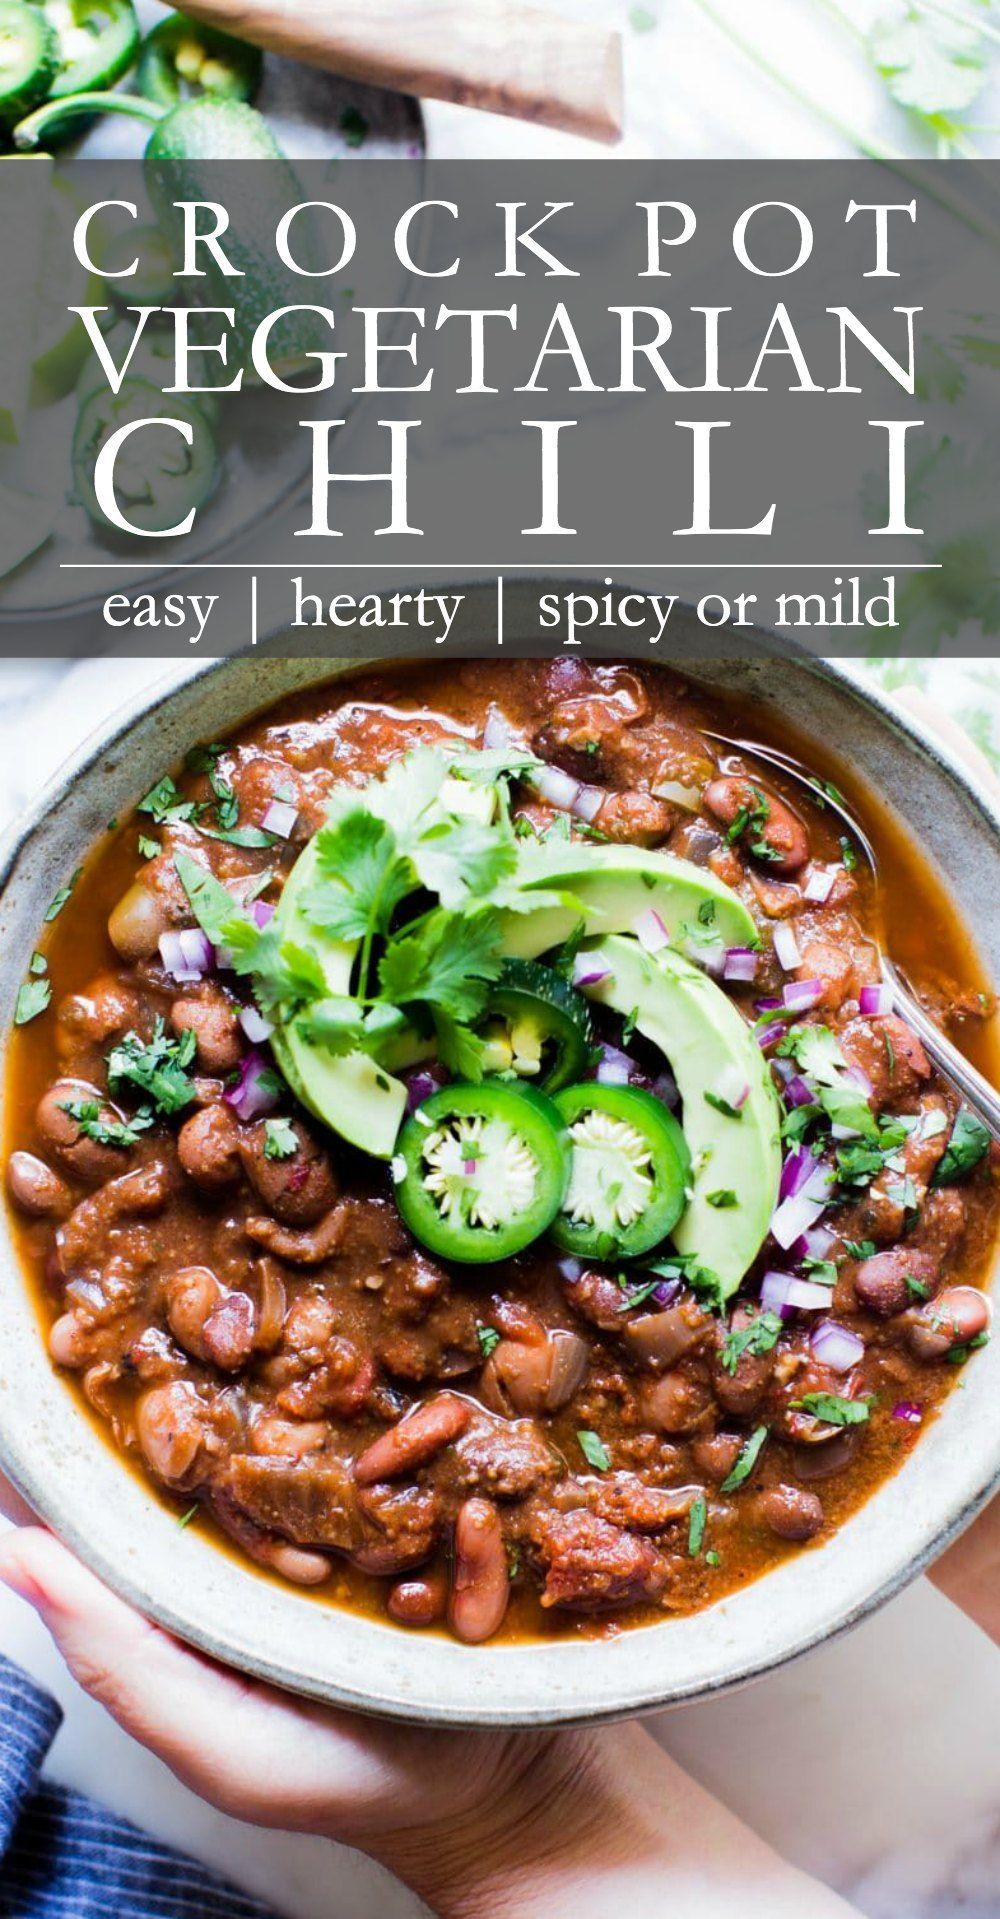 Hearty Crock Pot Vegetarian Chili In 2020 Vegetarian Crockpot Vegetarian Chili Crock Pot Slow Cooker Chili Recipe